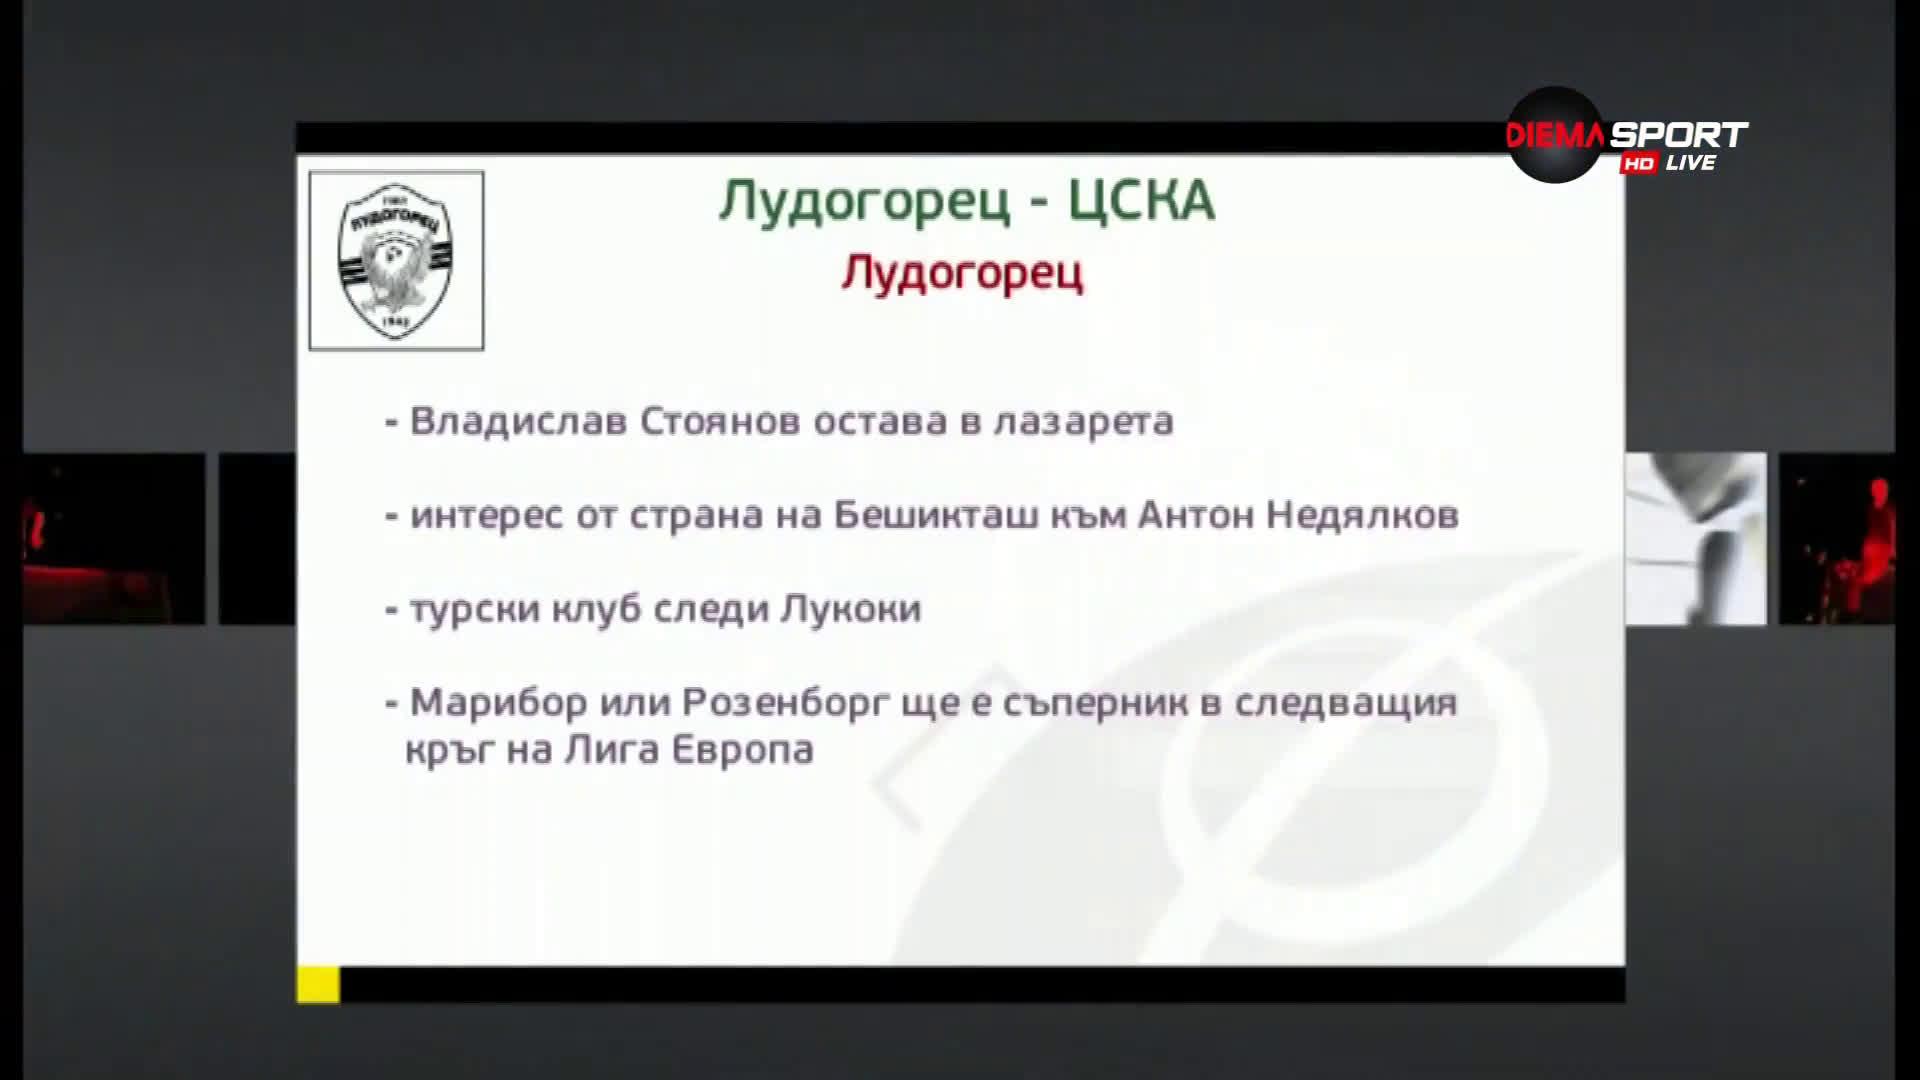 Преди Лудогорец - ЦСКА